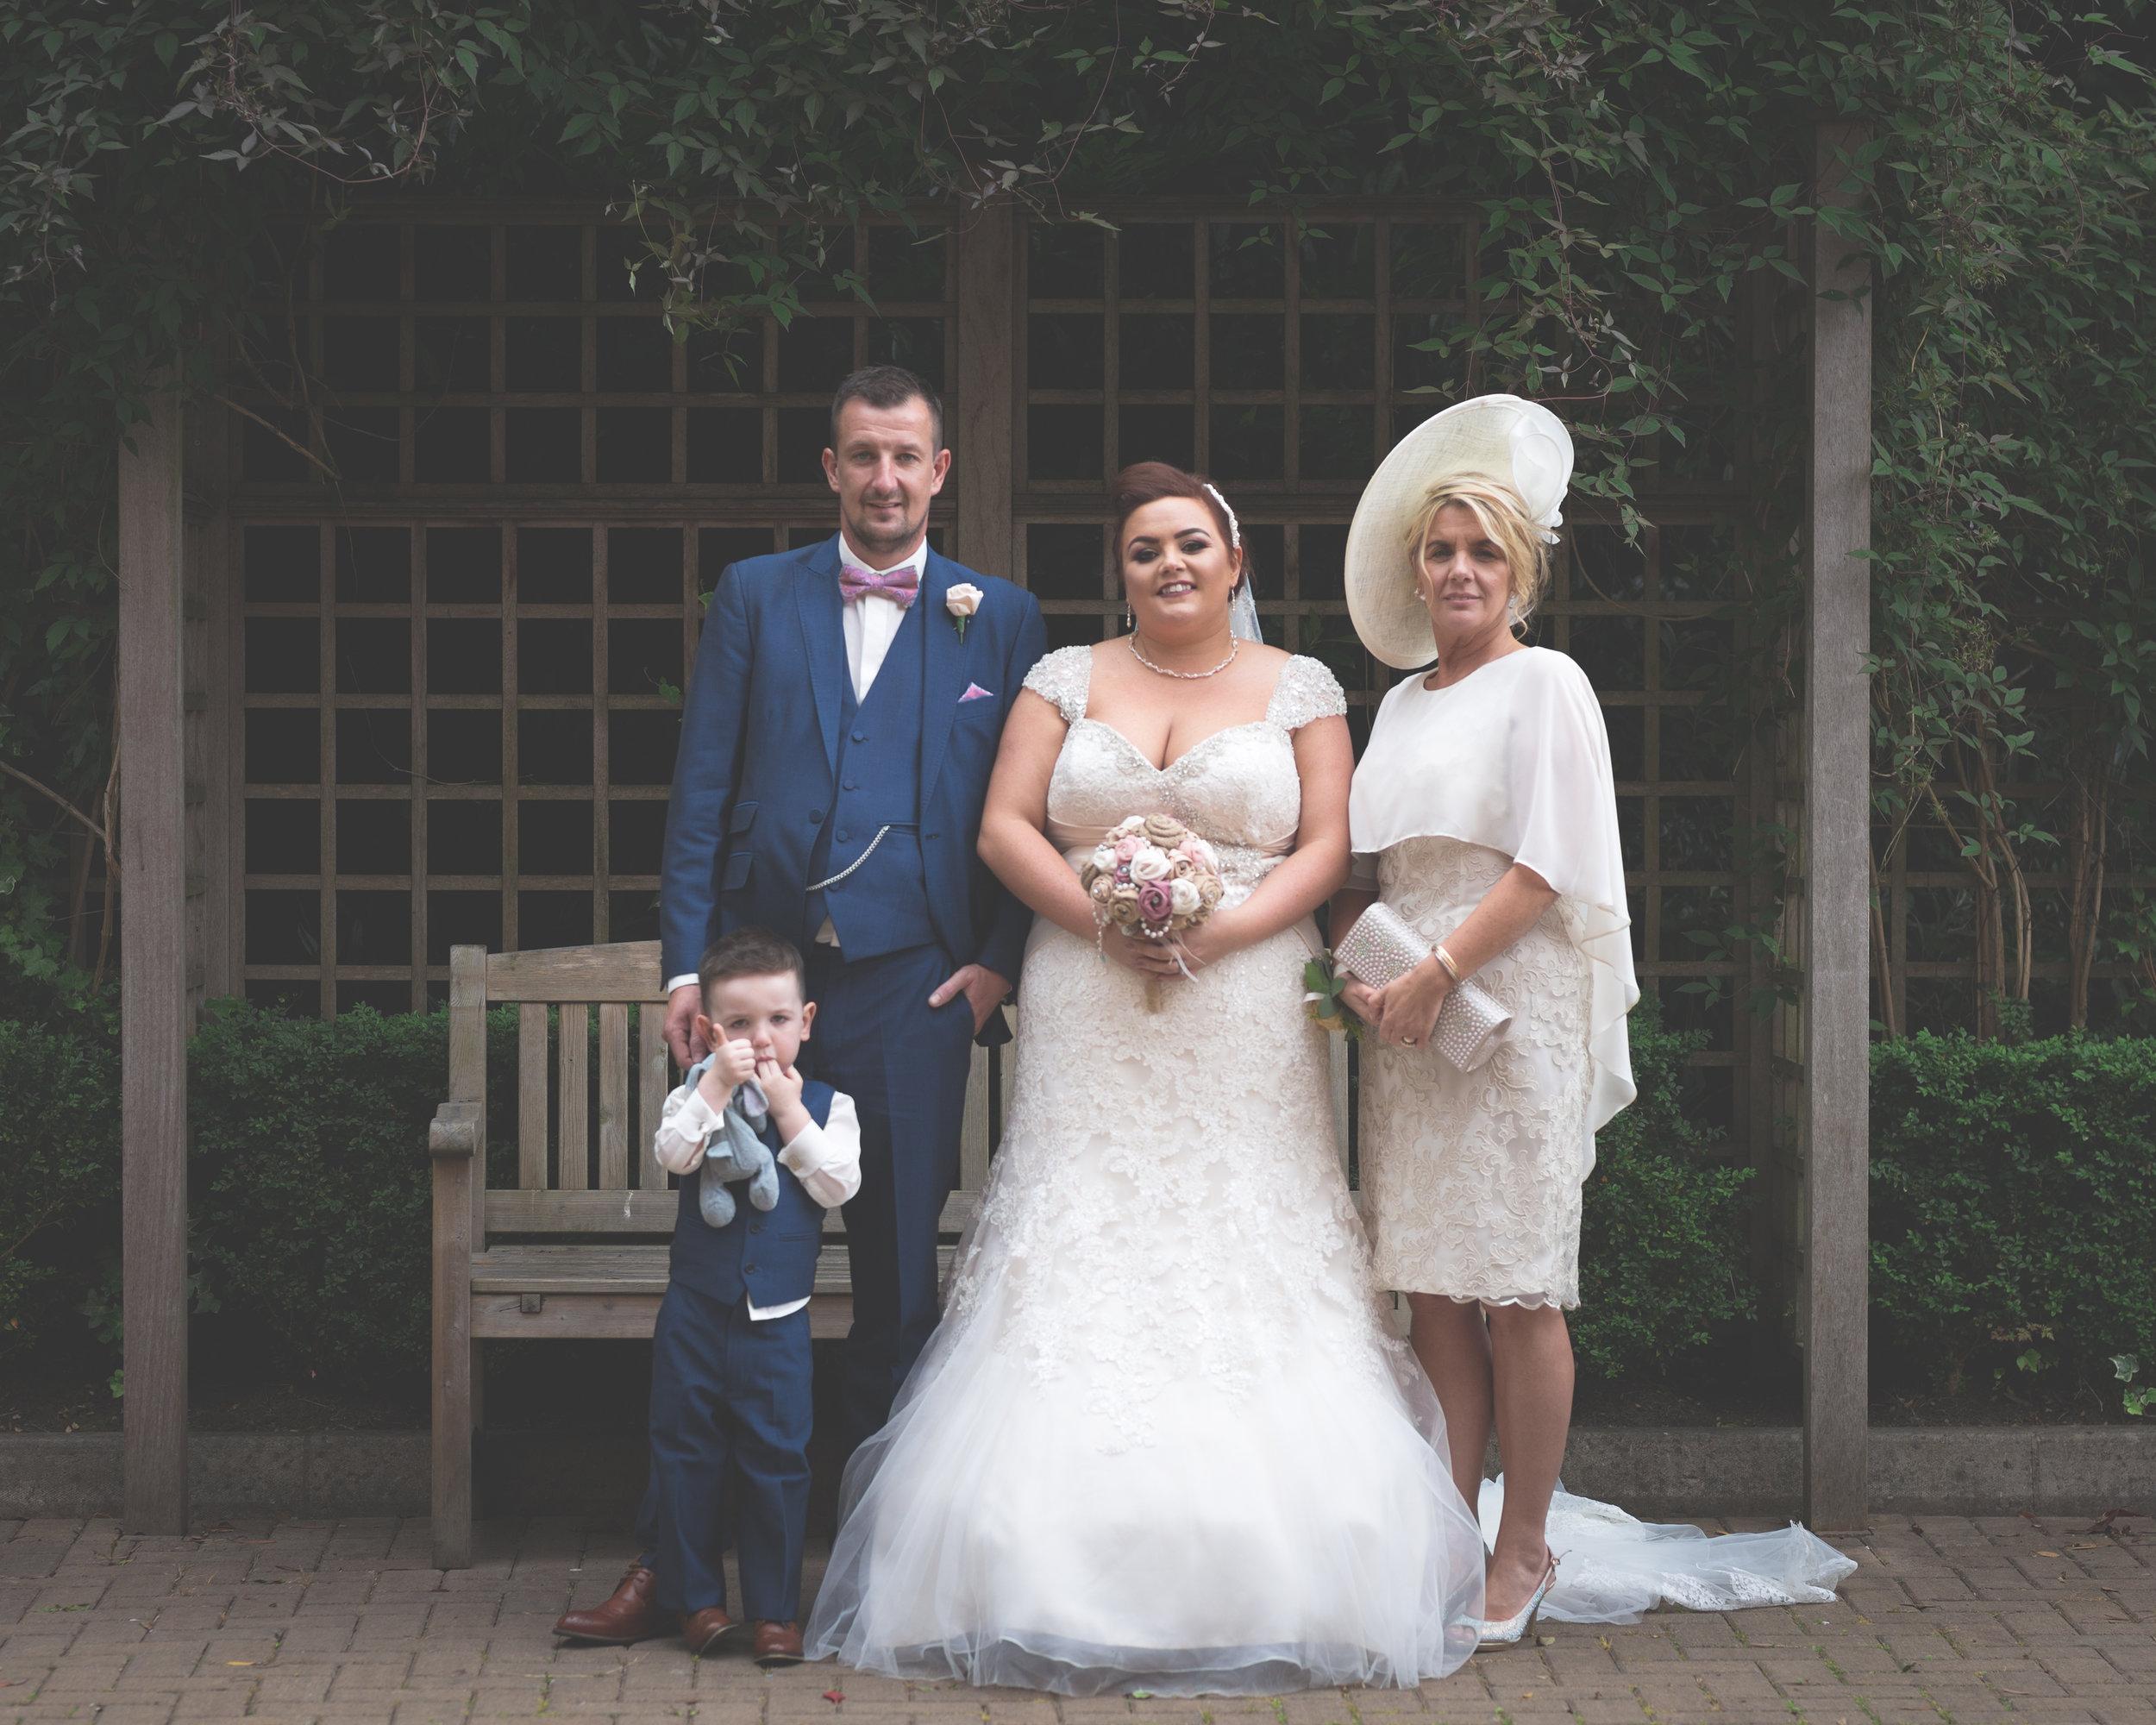 Antoinette & Stephen - Portraits   Brian McEwan Photography   Wedding Photographer Northern Ireland 55.jpg